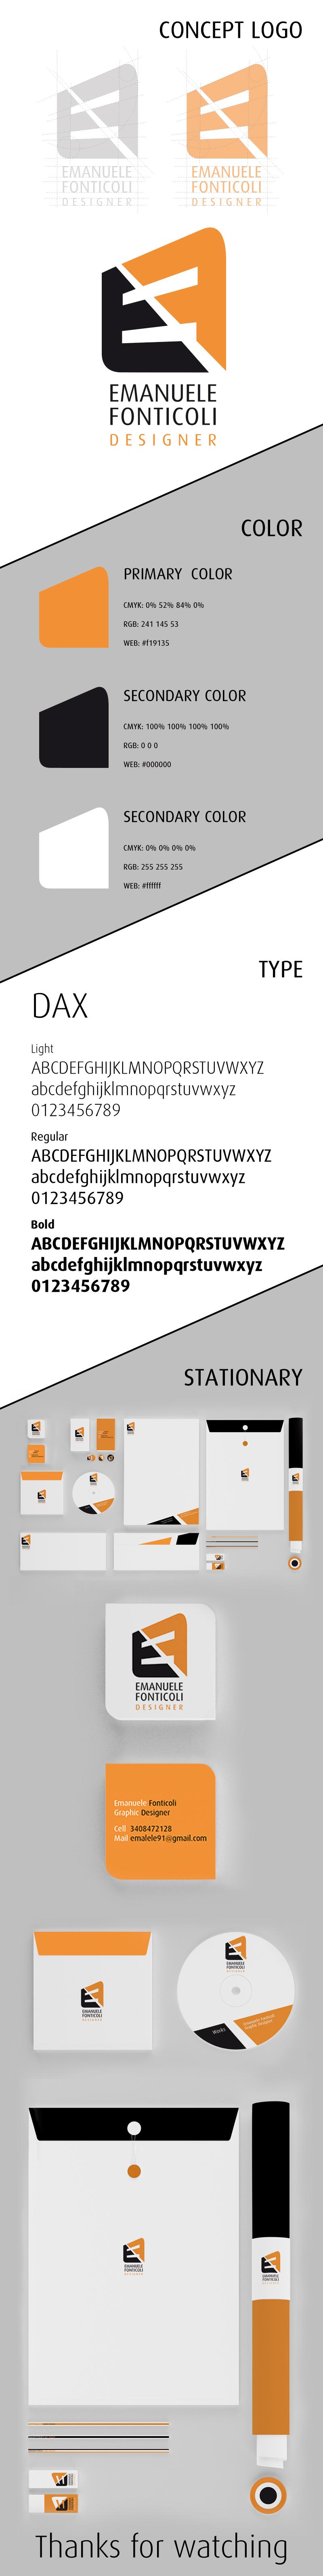 The all project https://www.behance.net/gallery/-MY-PERSONAL-LOGO-/3470169